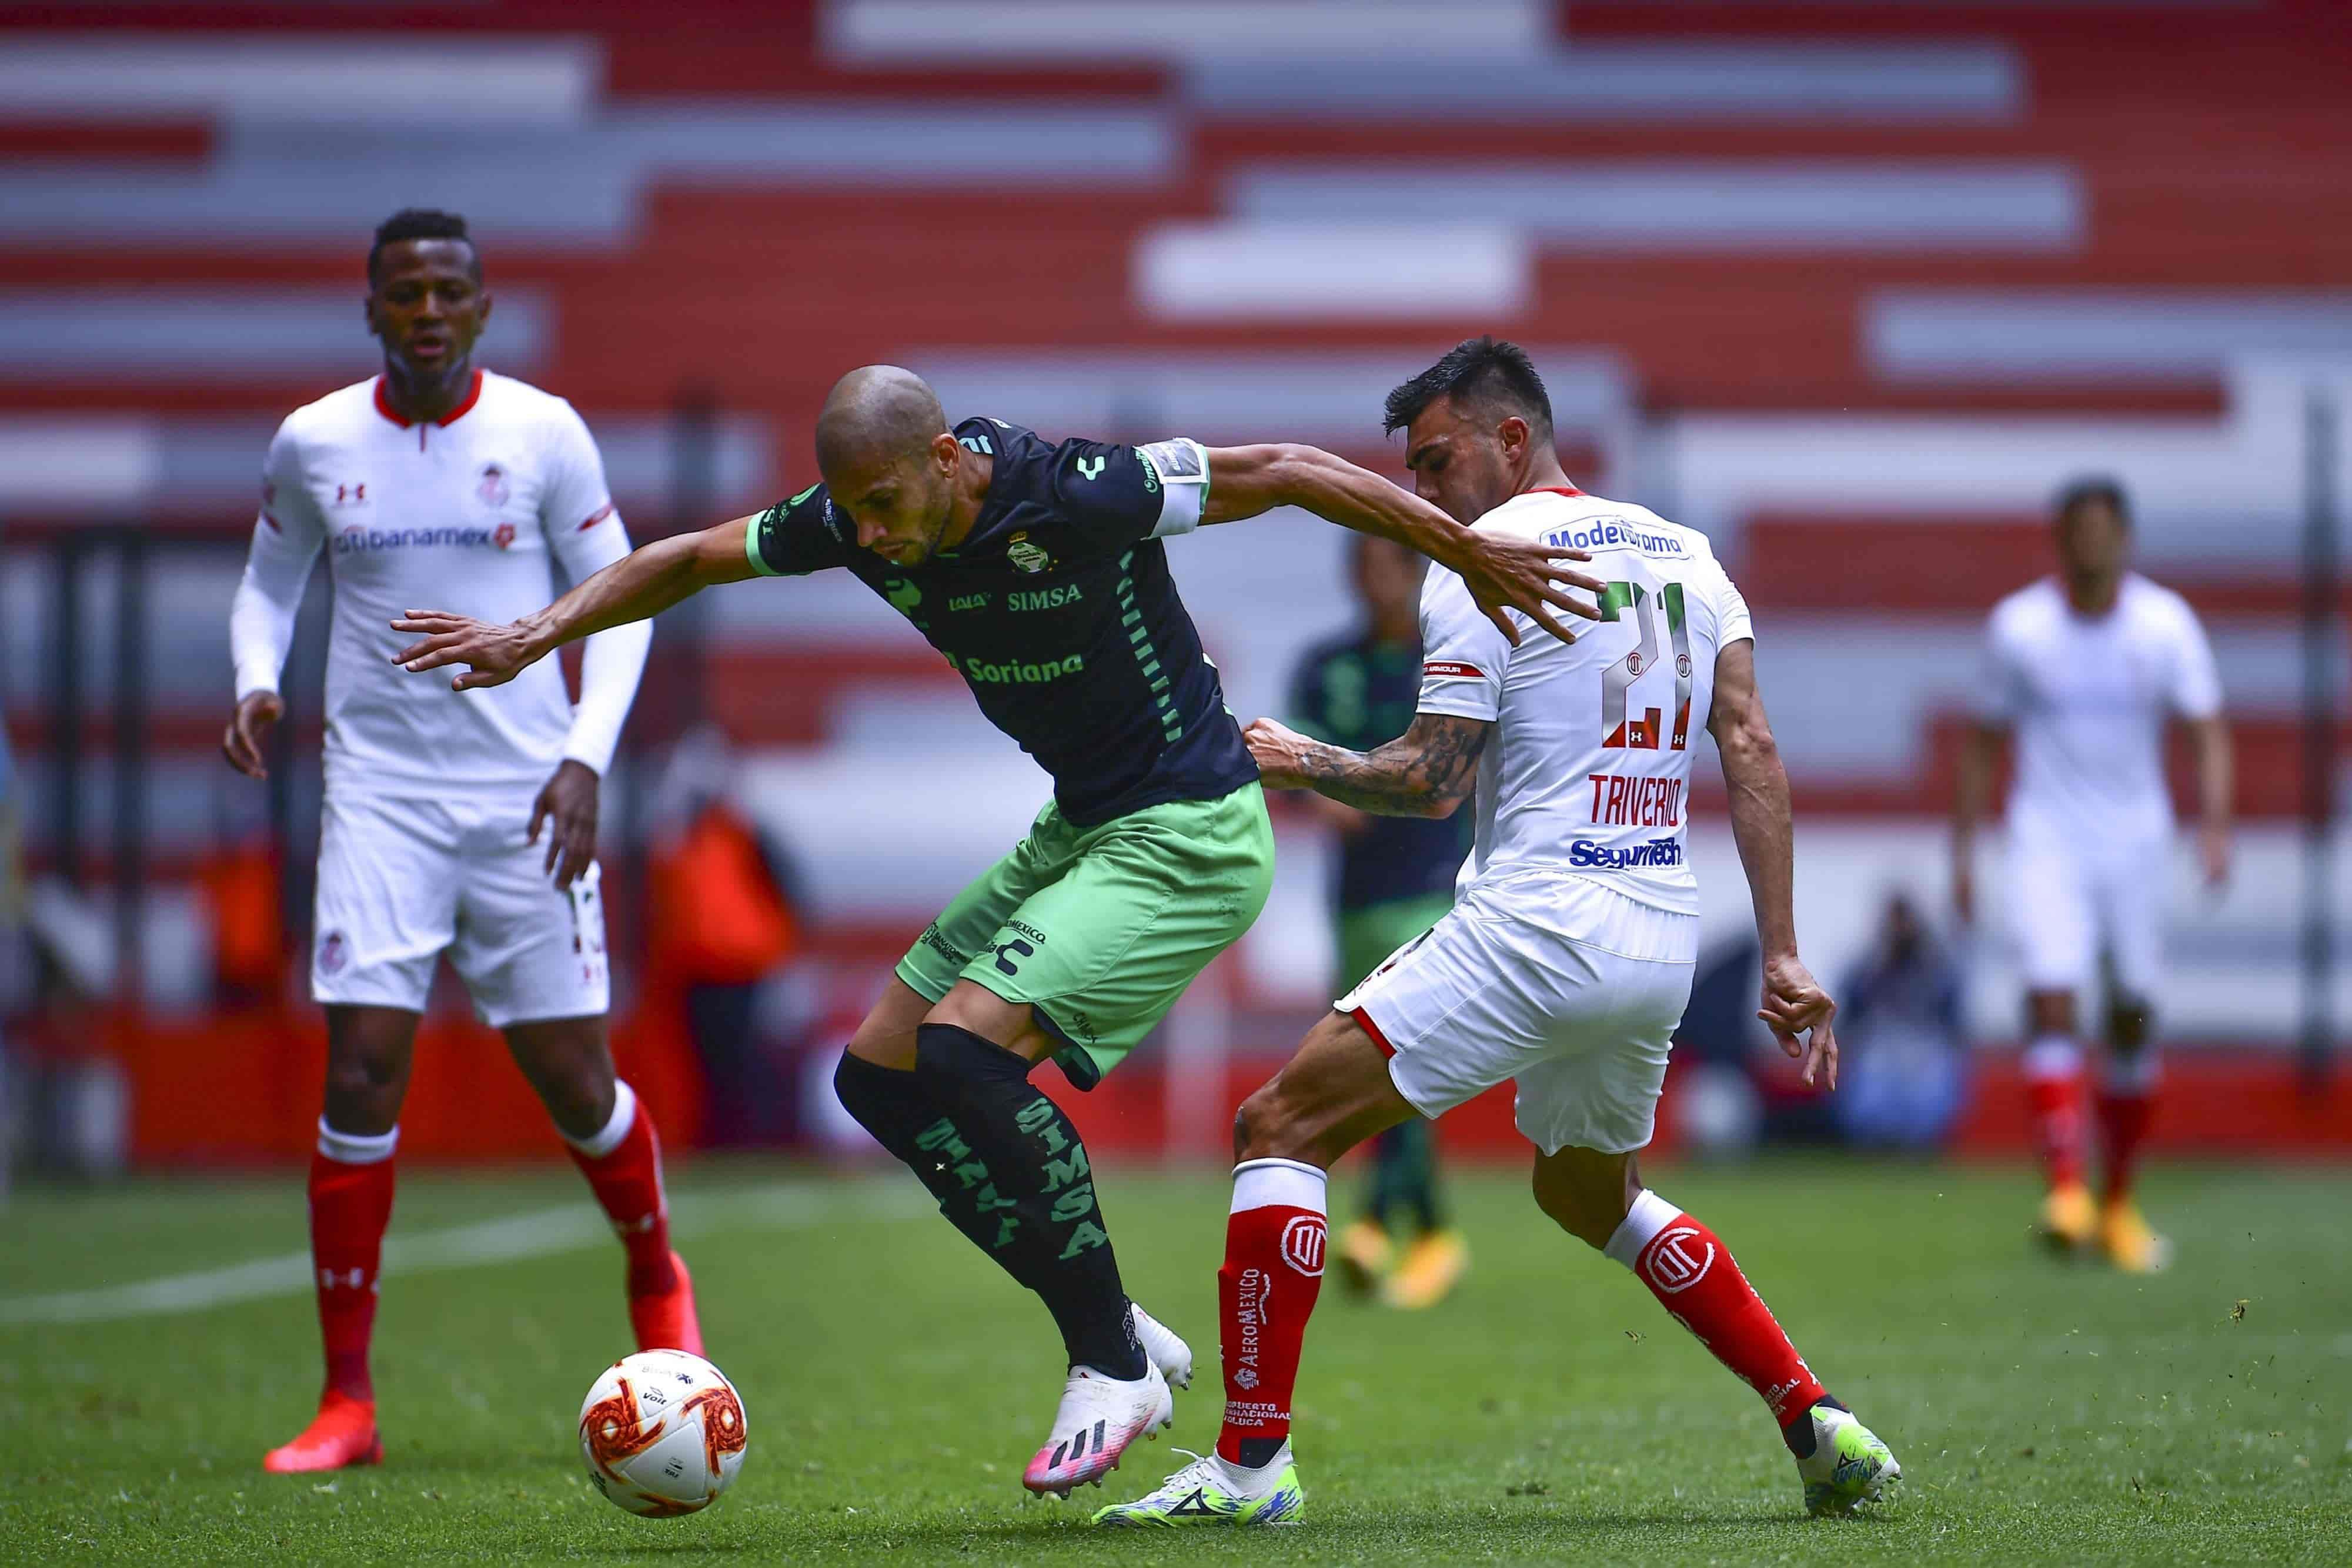 Toluca 1 - 2 Santos